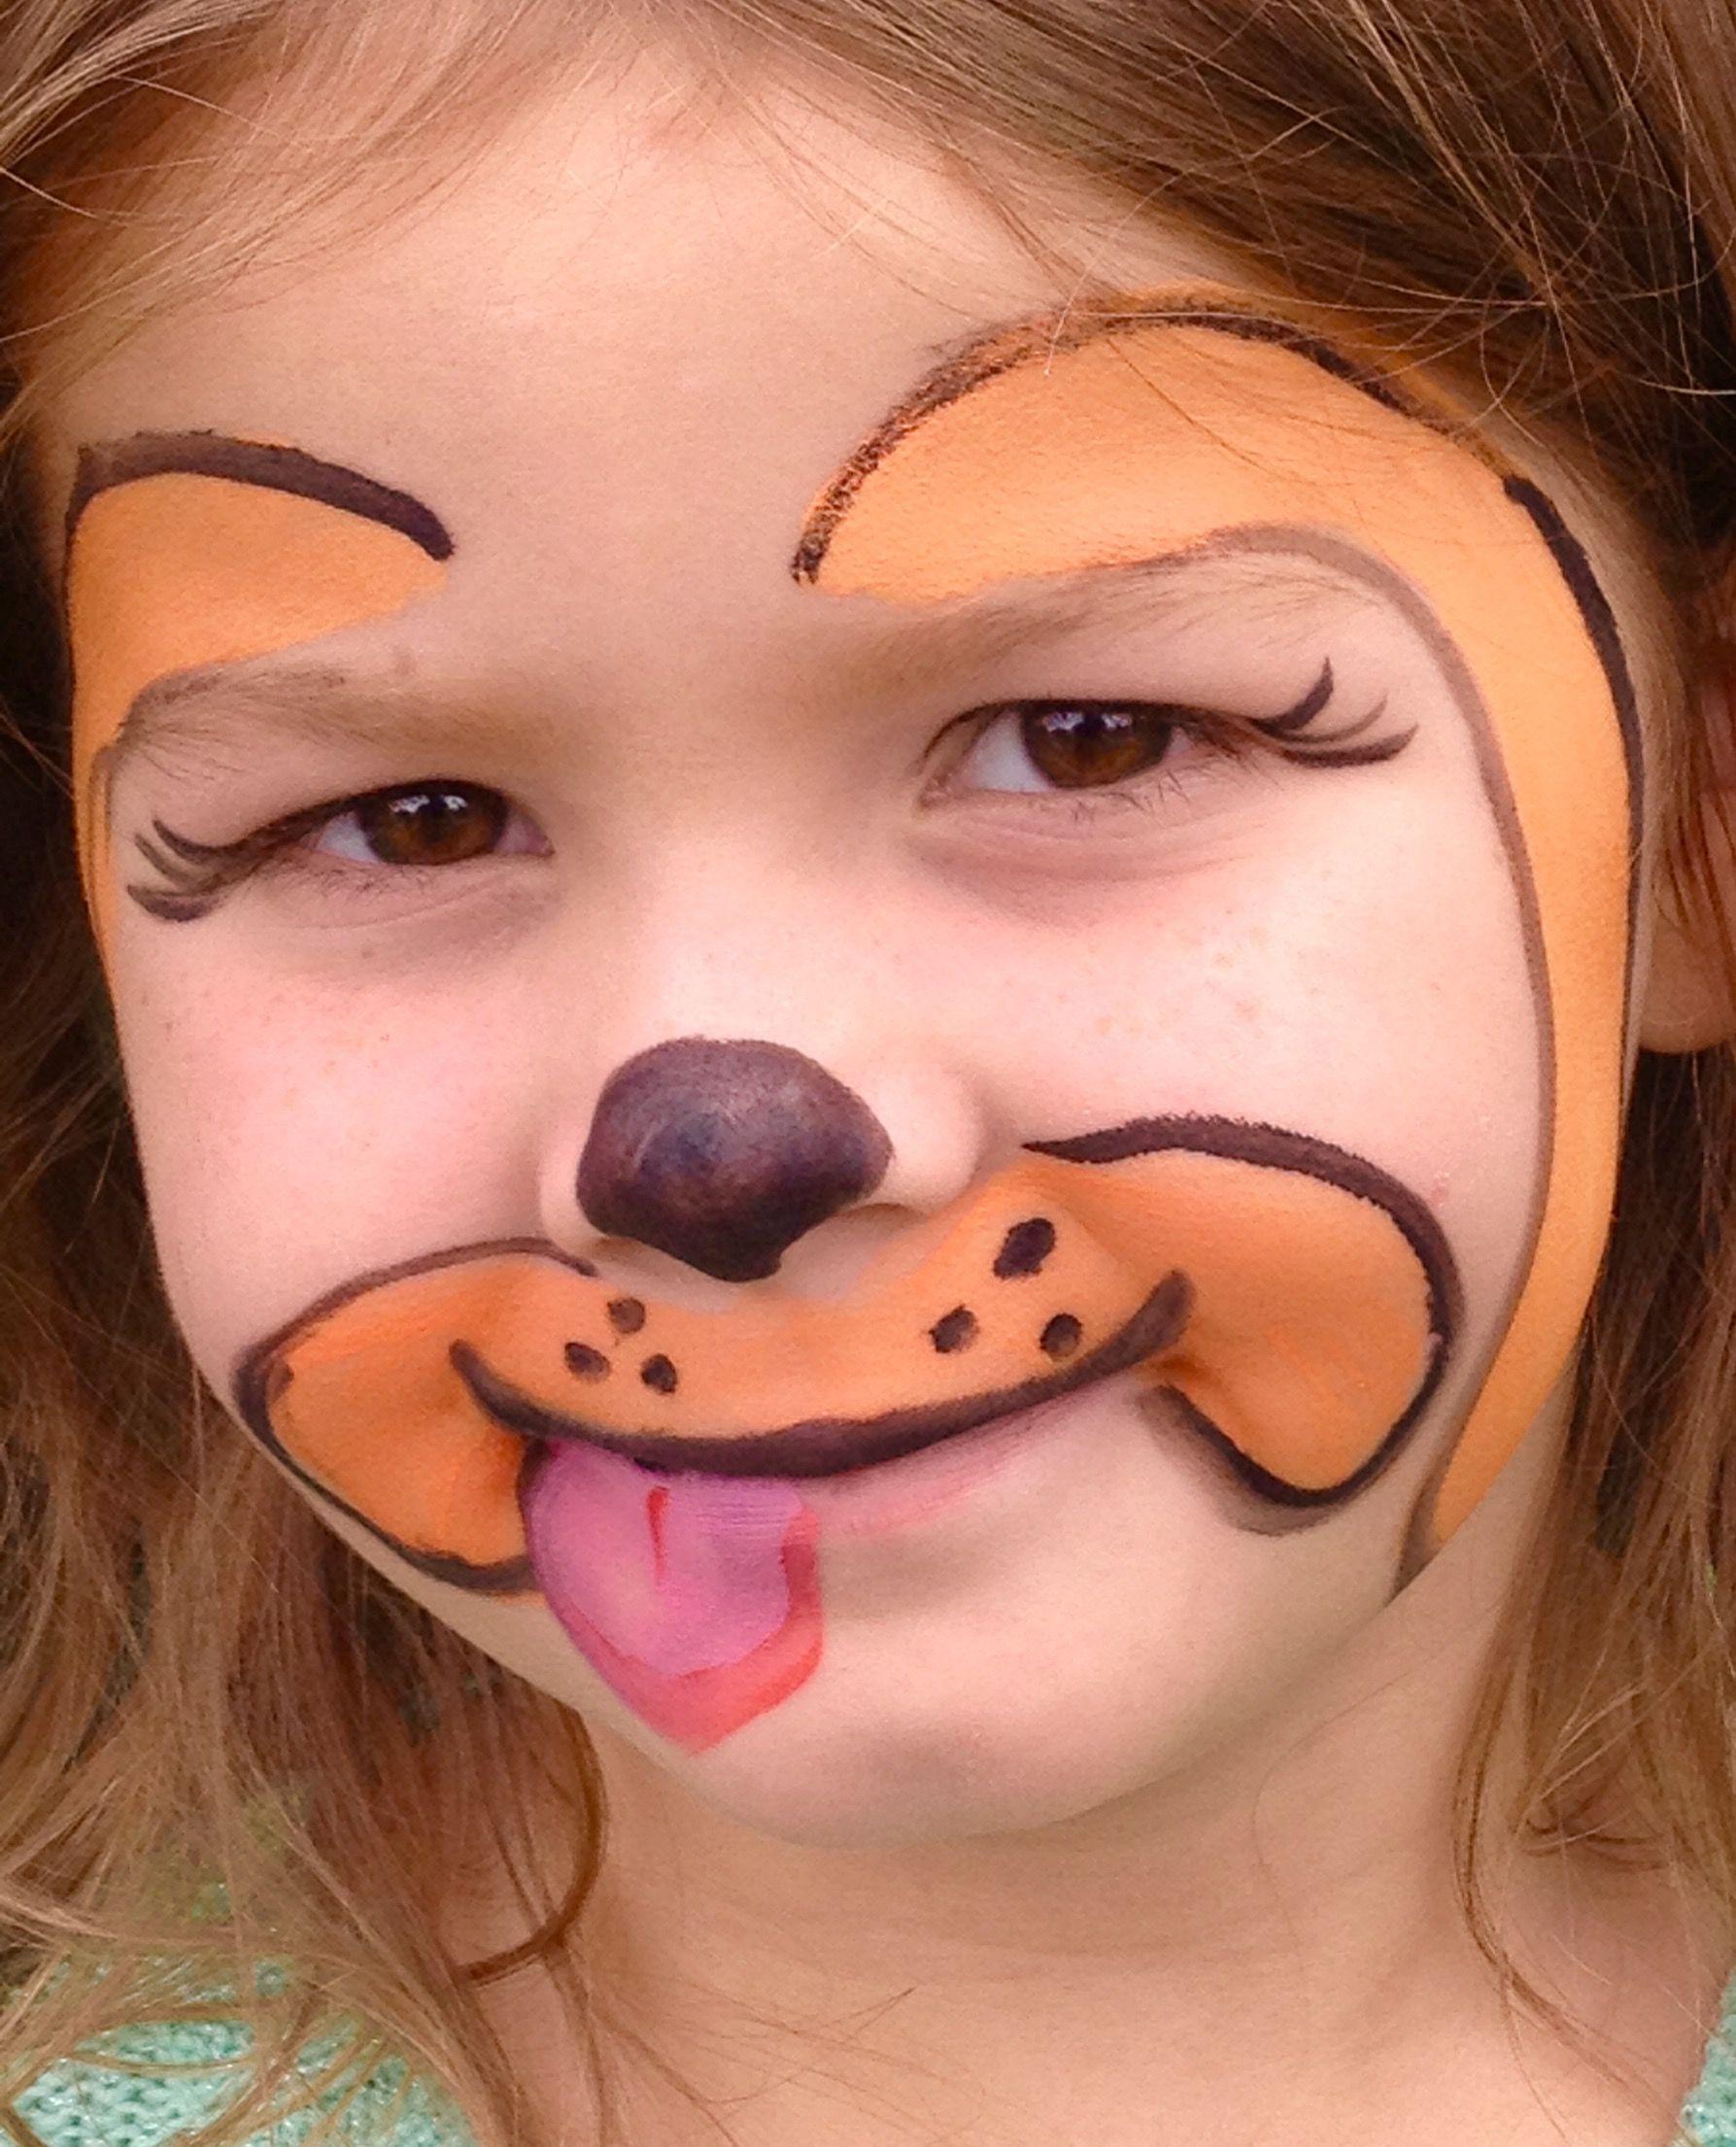 Dog Facepaint Golden Retriever Eye La S Facepainting Body